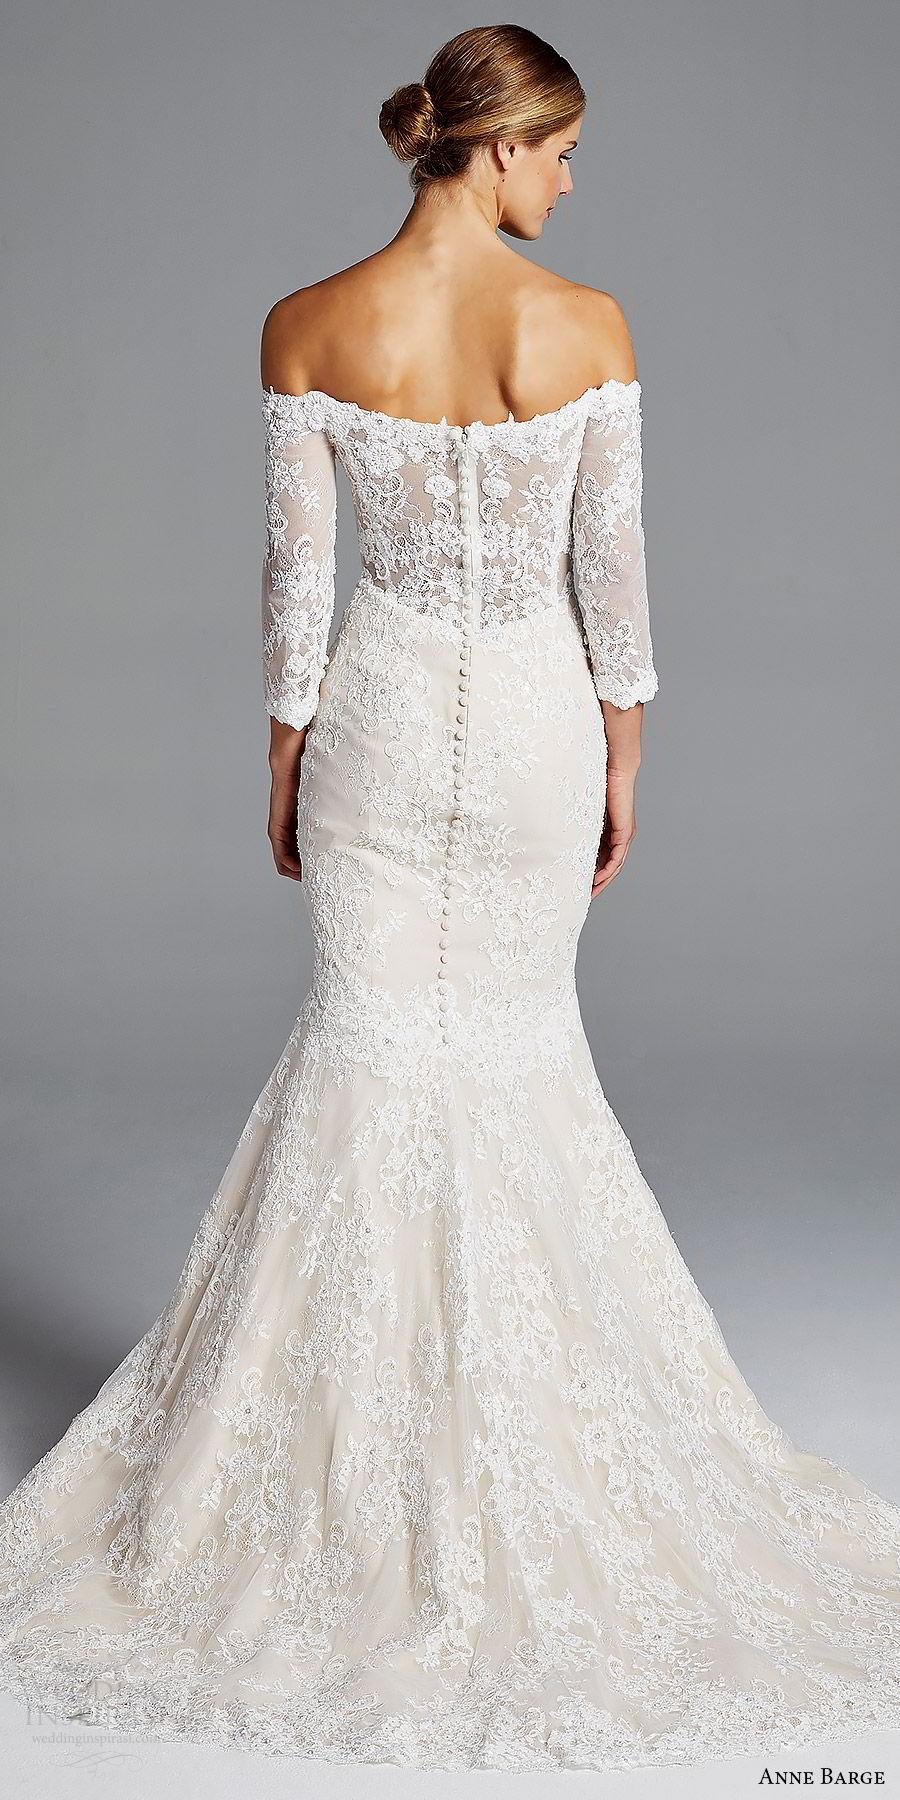 anne barge bridal spring 2019 3 quarter sleeves off shoulder illusion sweetheart lace mermaid wedding dress (loren) bv scoop back chapel train elegant romantic